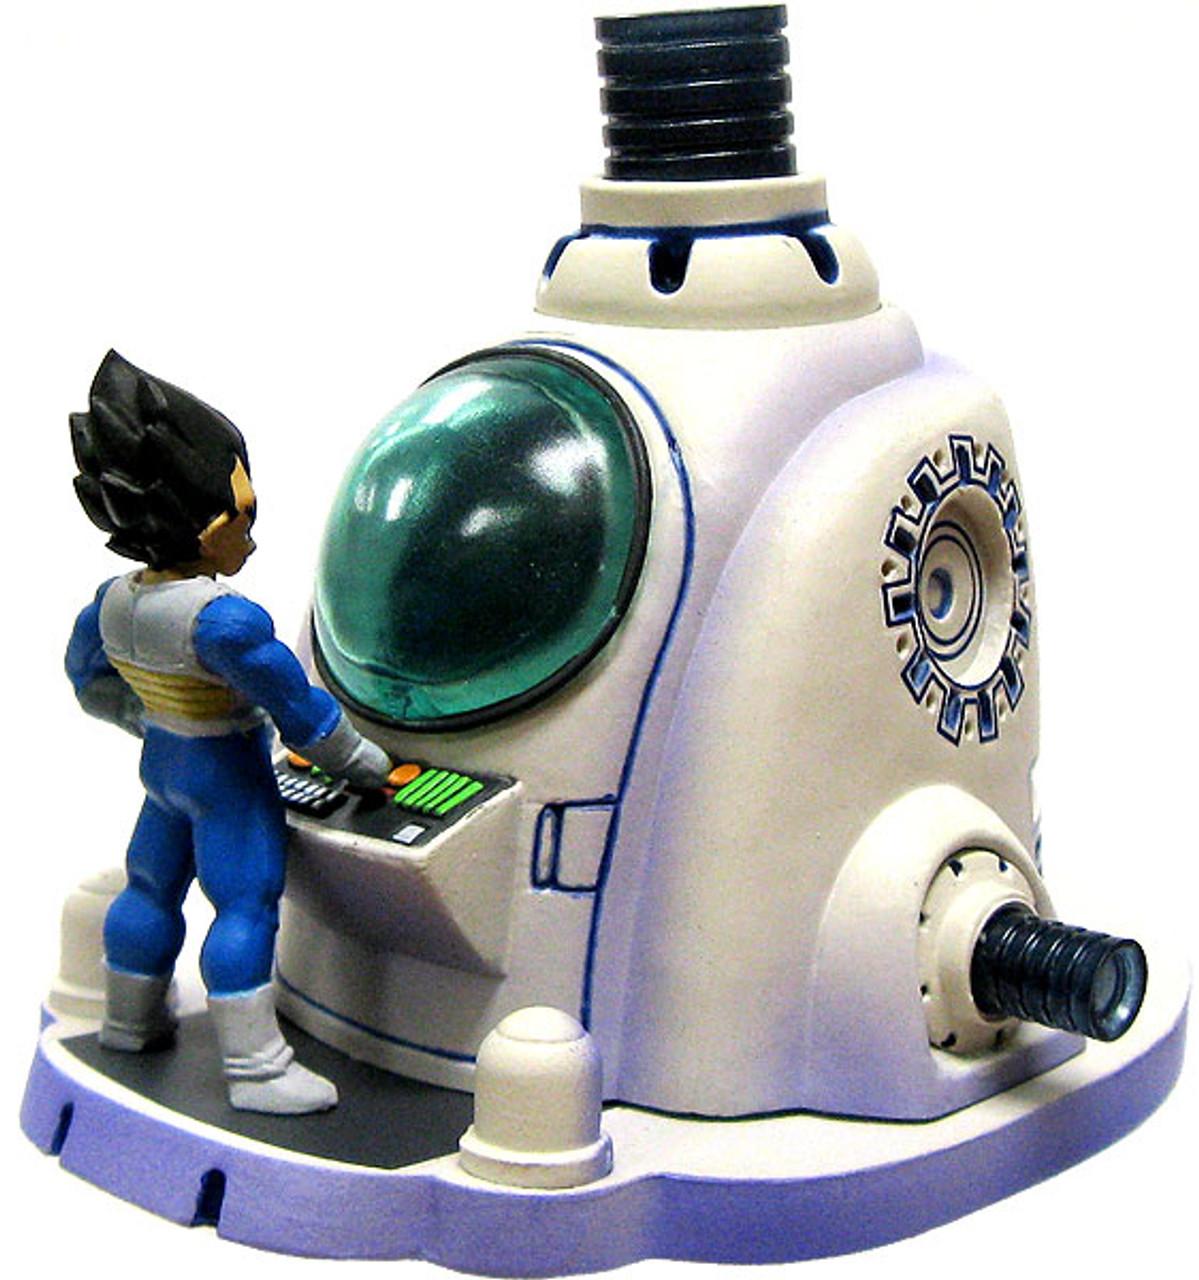 Dragon Ball Kai MegaHouse The Healing Machine 3.5-Inch Chase PVC Figure [Goku & Vegeta]